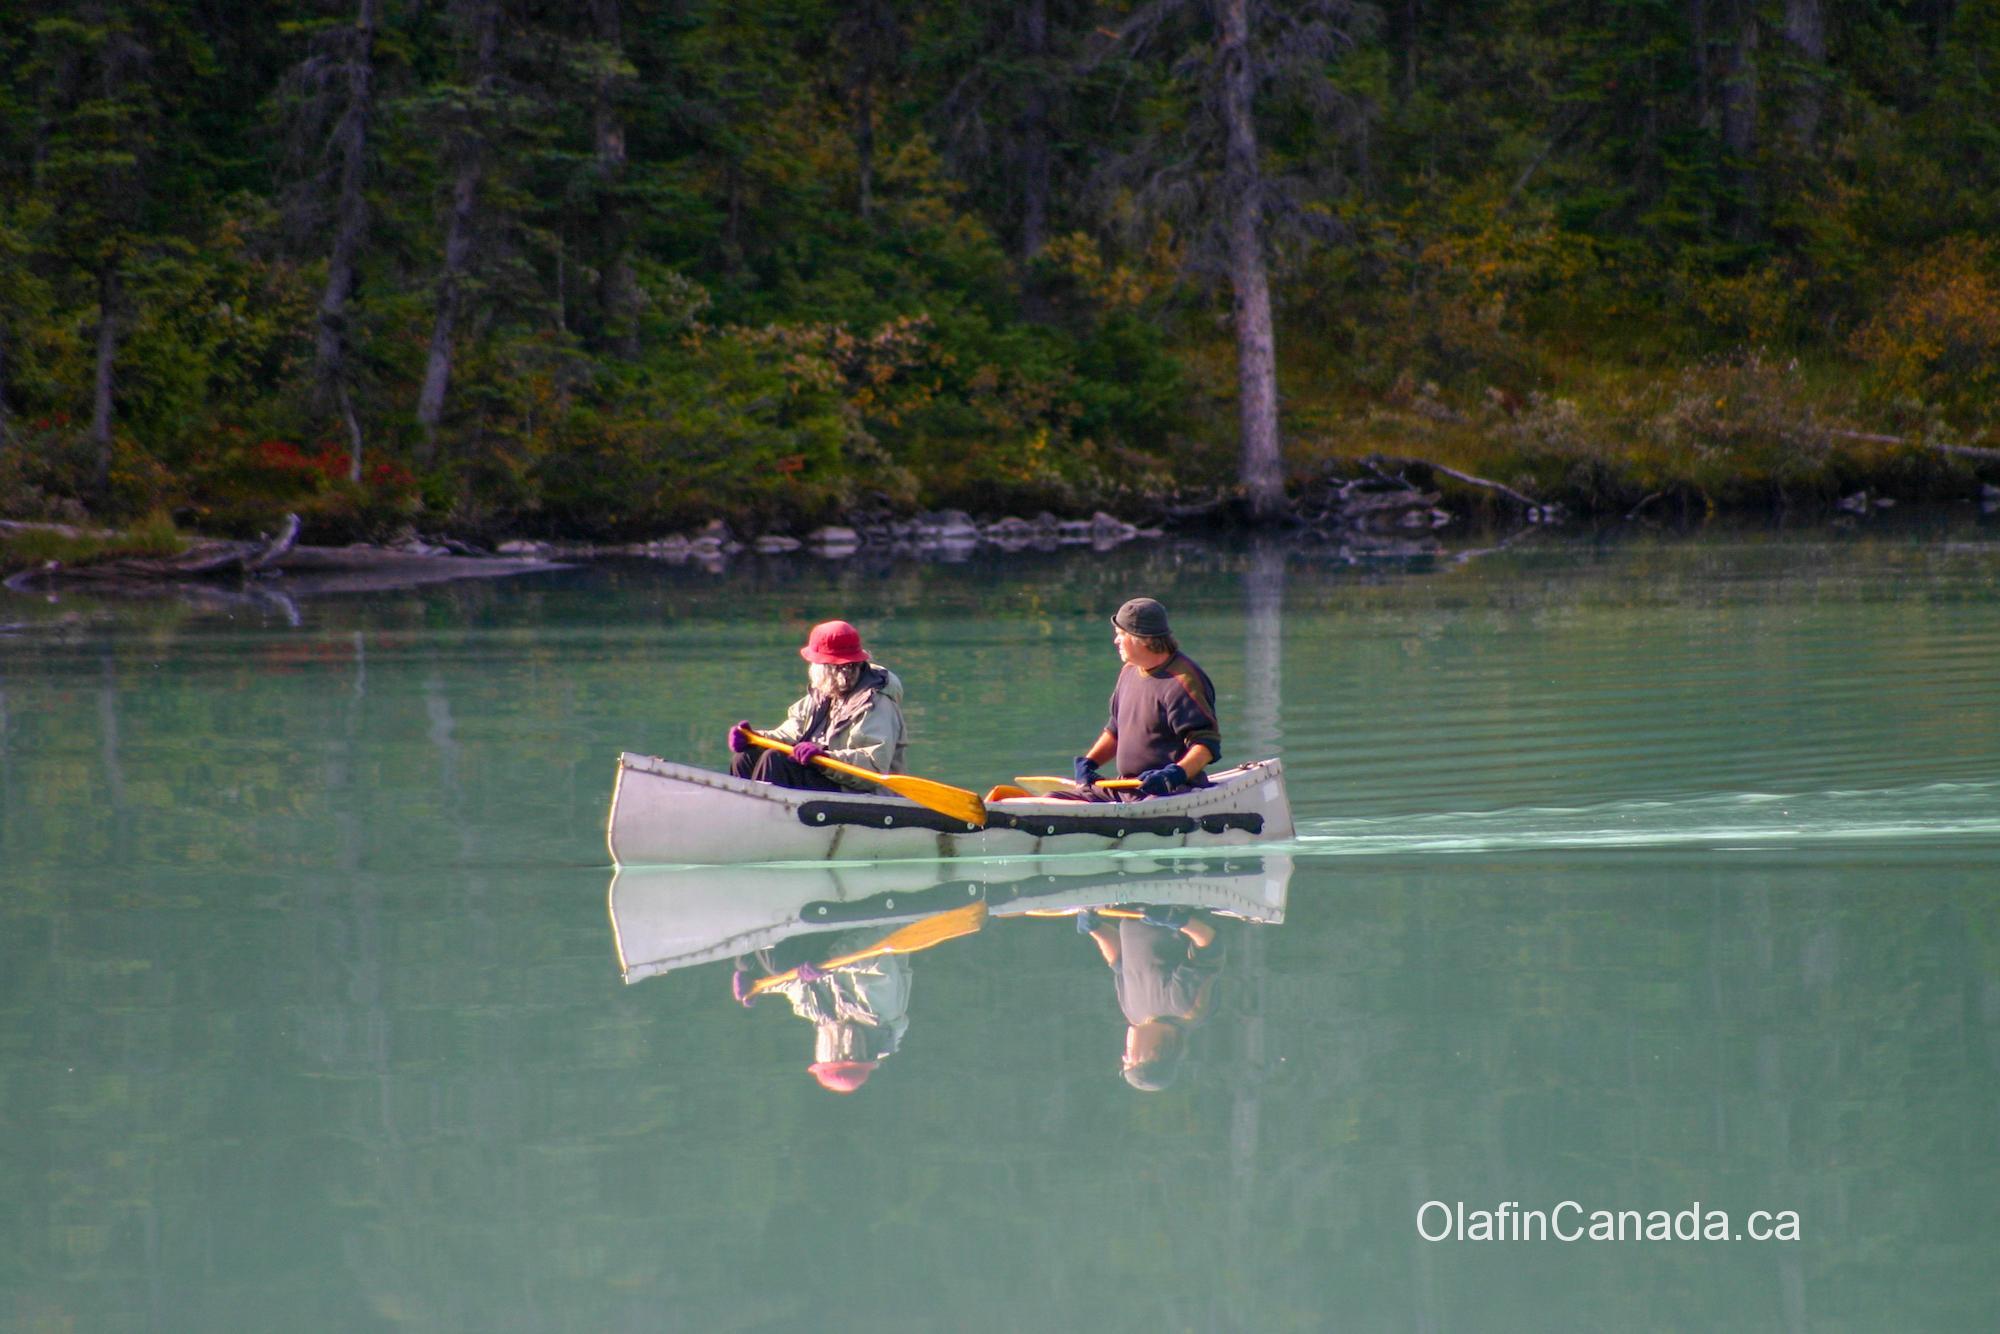 Canoeing on Moraine Lake with mirror reflection #olafincanada #alberta #rockies #morainelake #valleyofthe10peaks